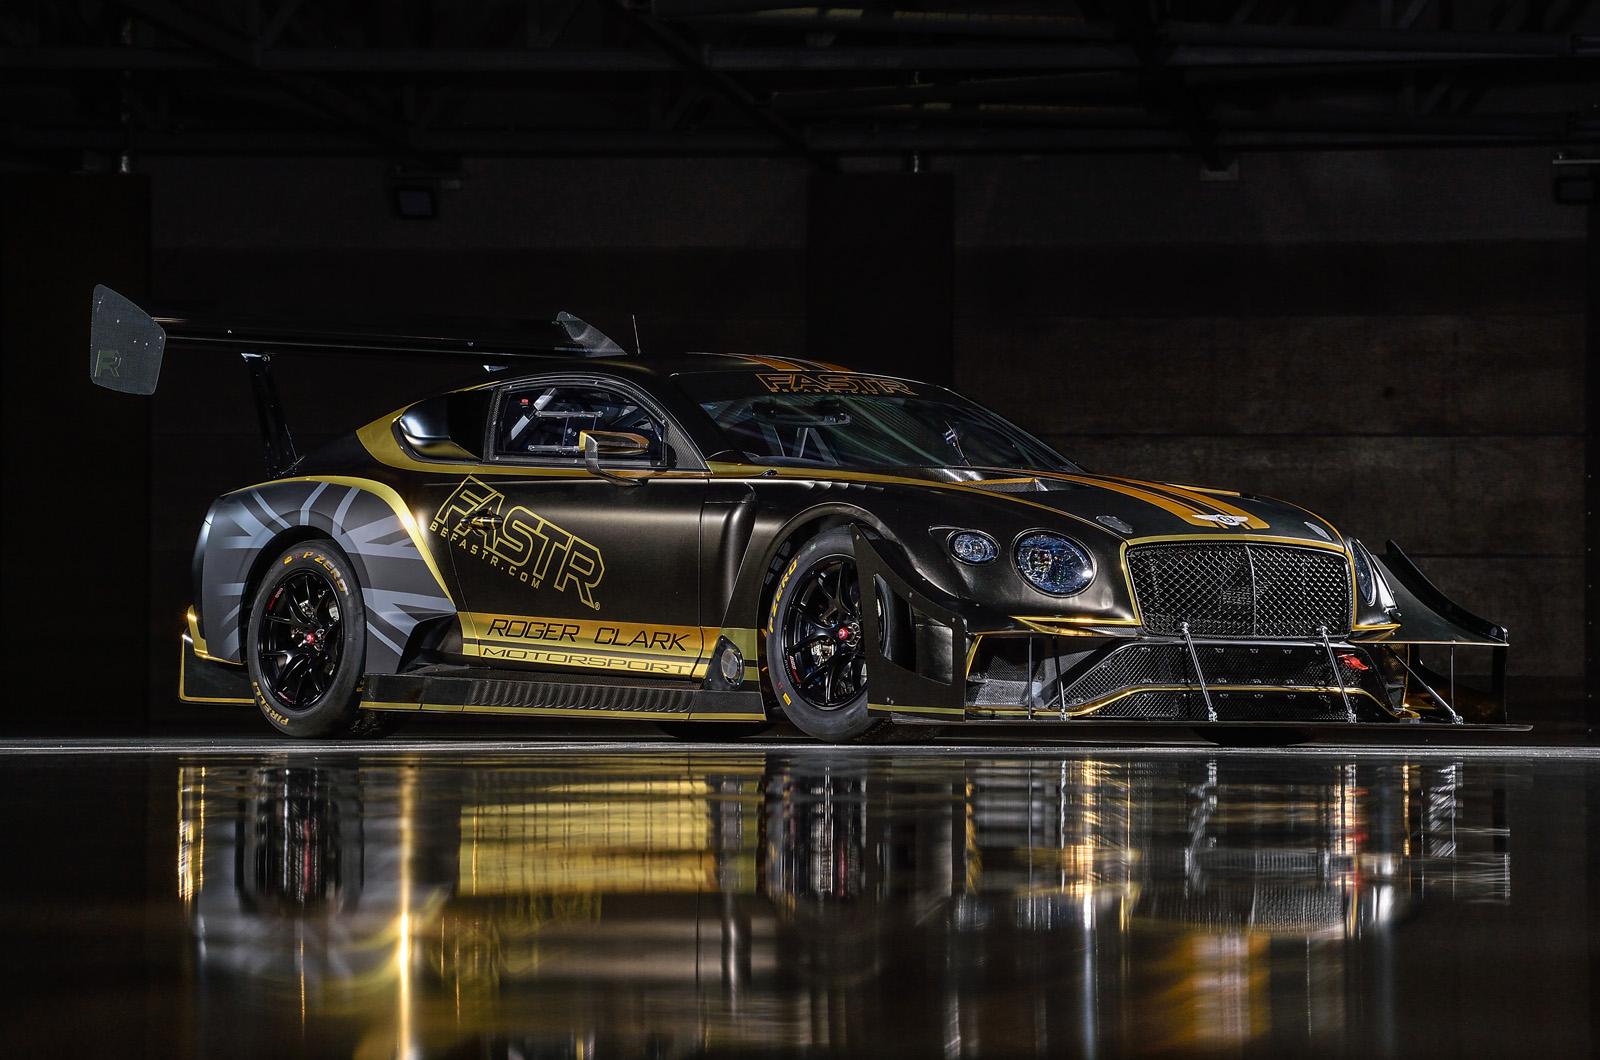 Bentley reveals wild Continental GT racer for final Pikes Peak run | Autocar